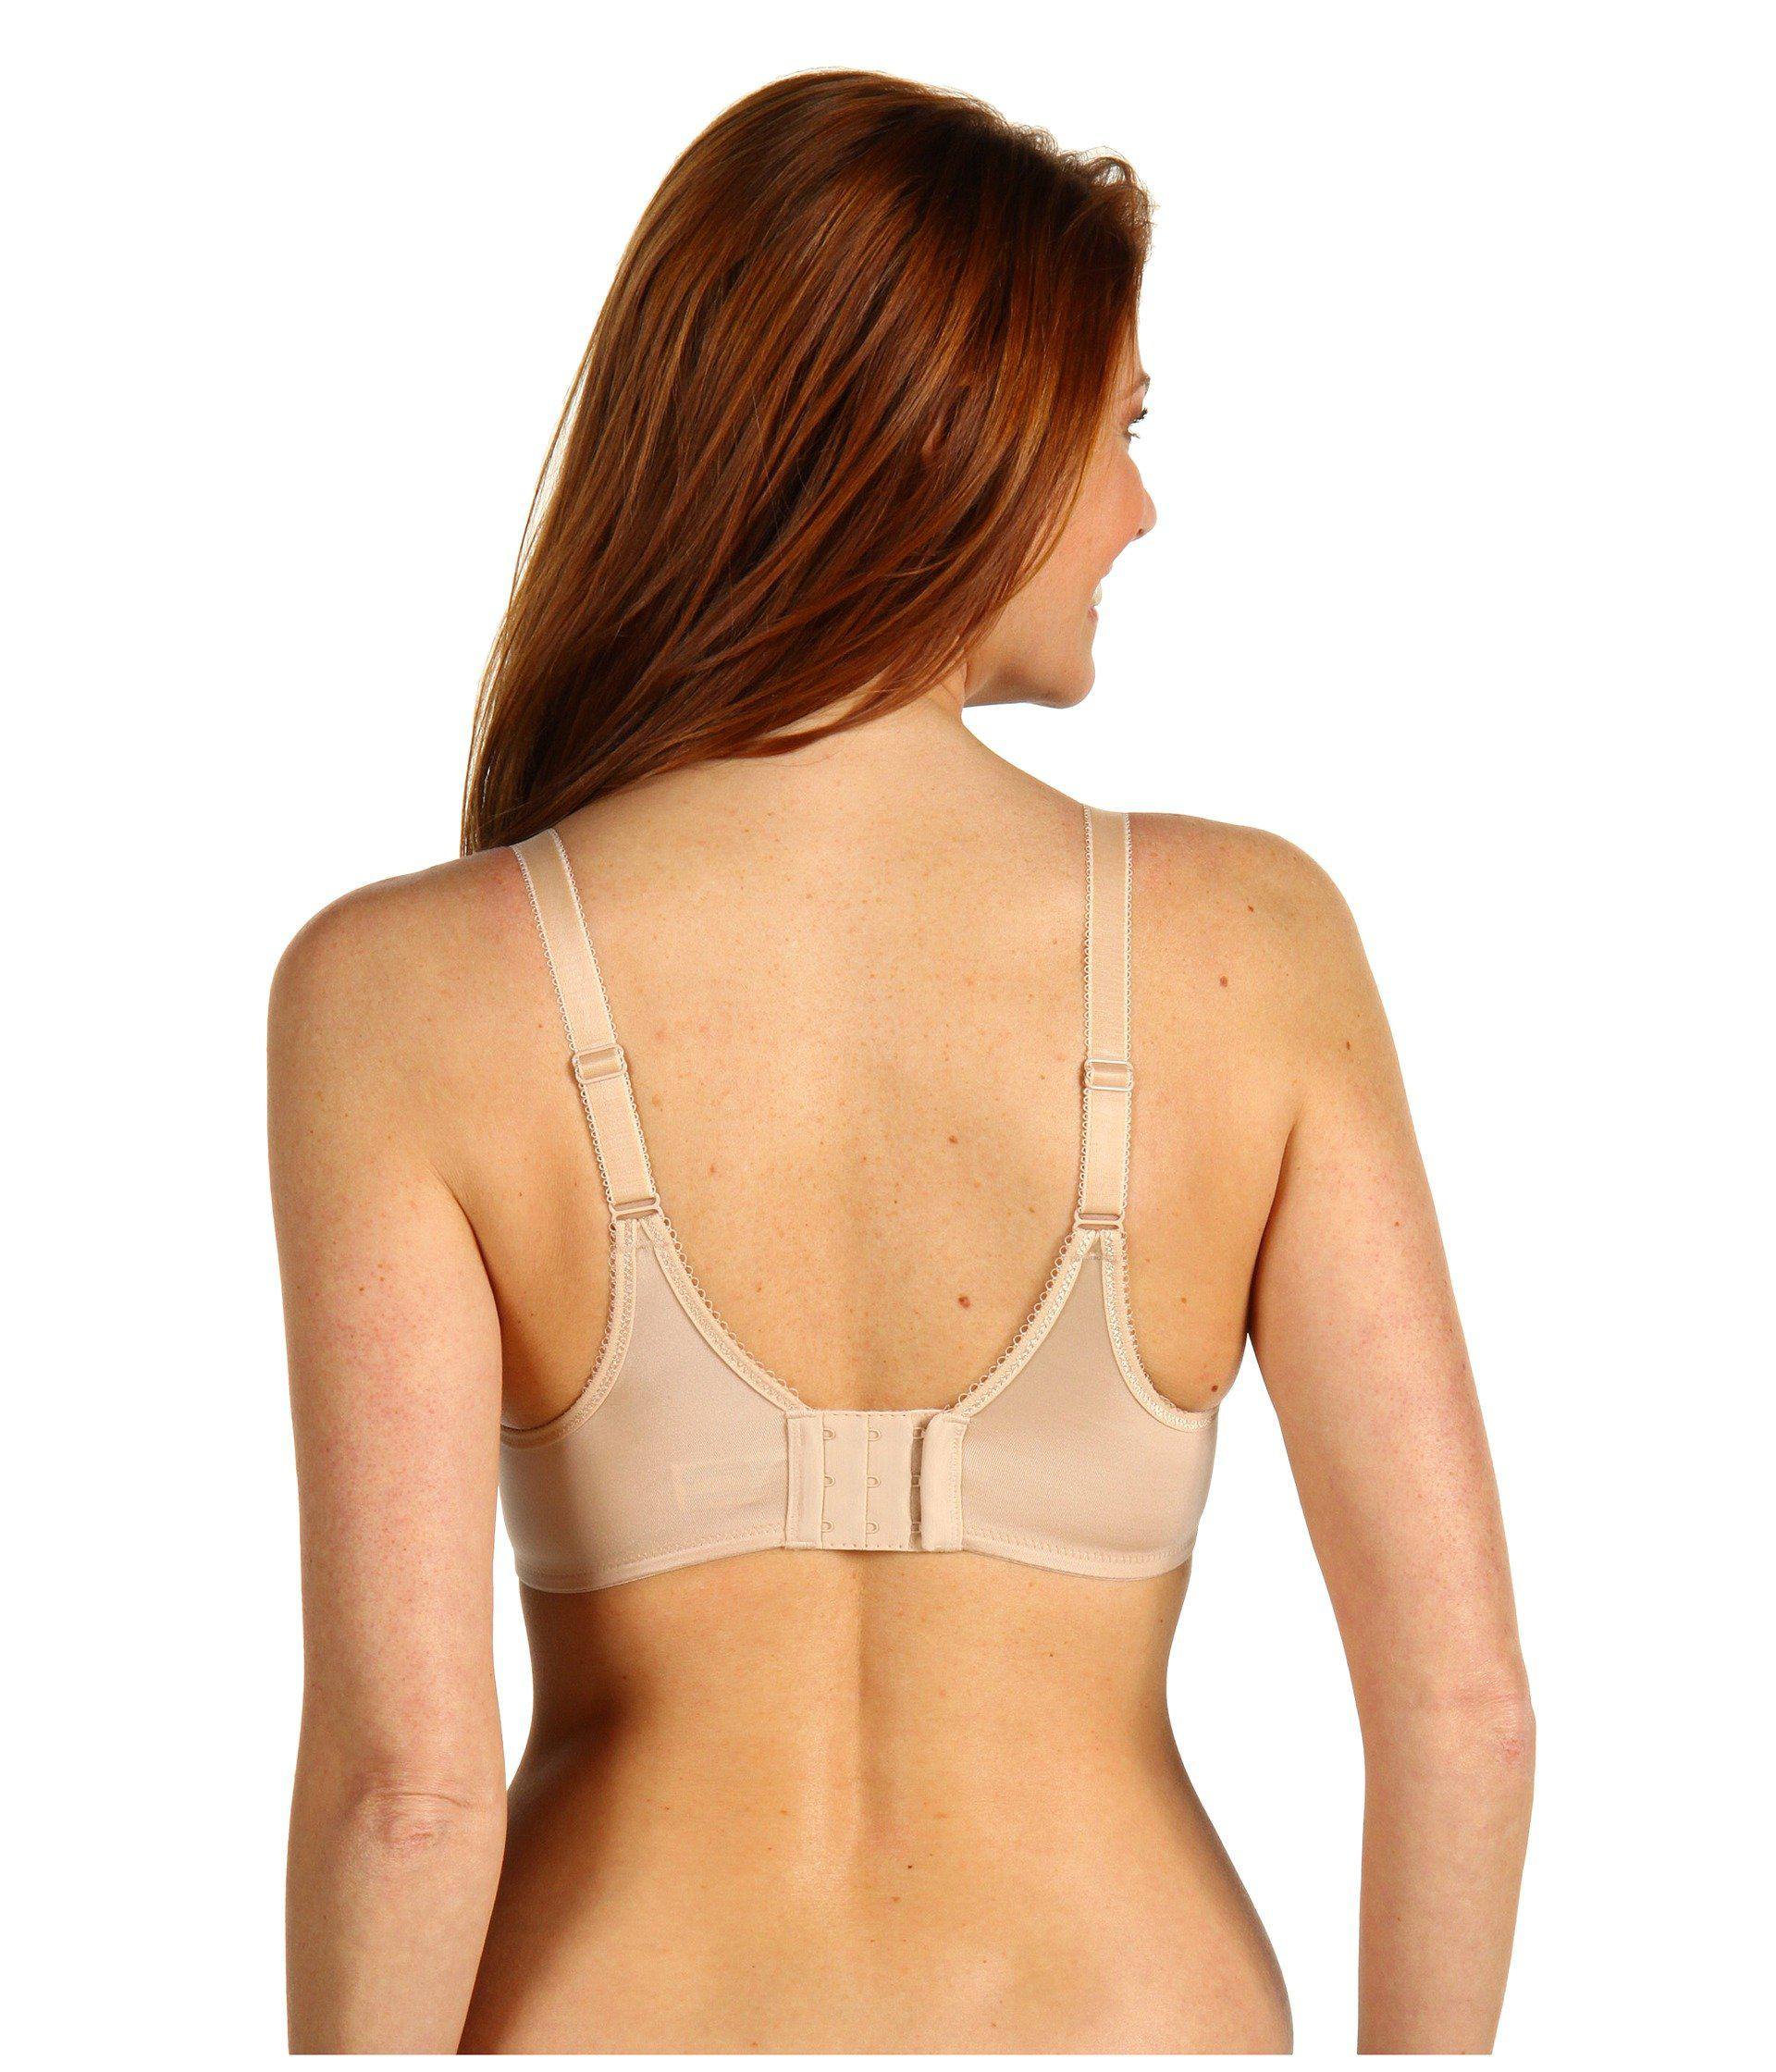 c0f34c1446 Wacoal - Natural Basic Beauty Full Figure Underwire Bra 855192 (ivory) Women s  Bra -. View fullscreen